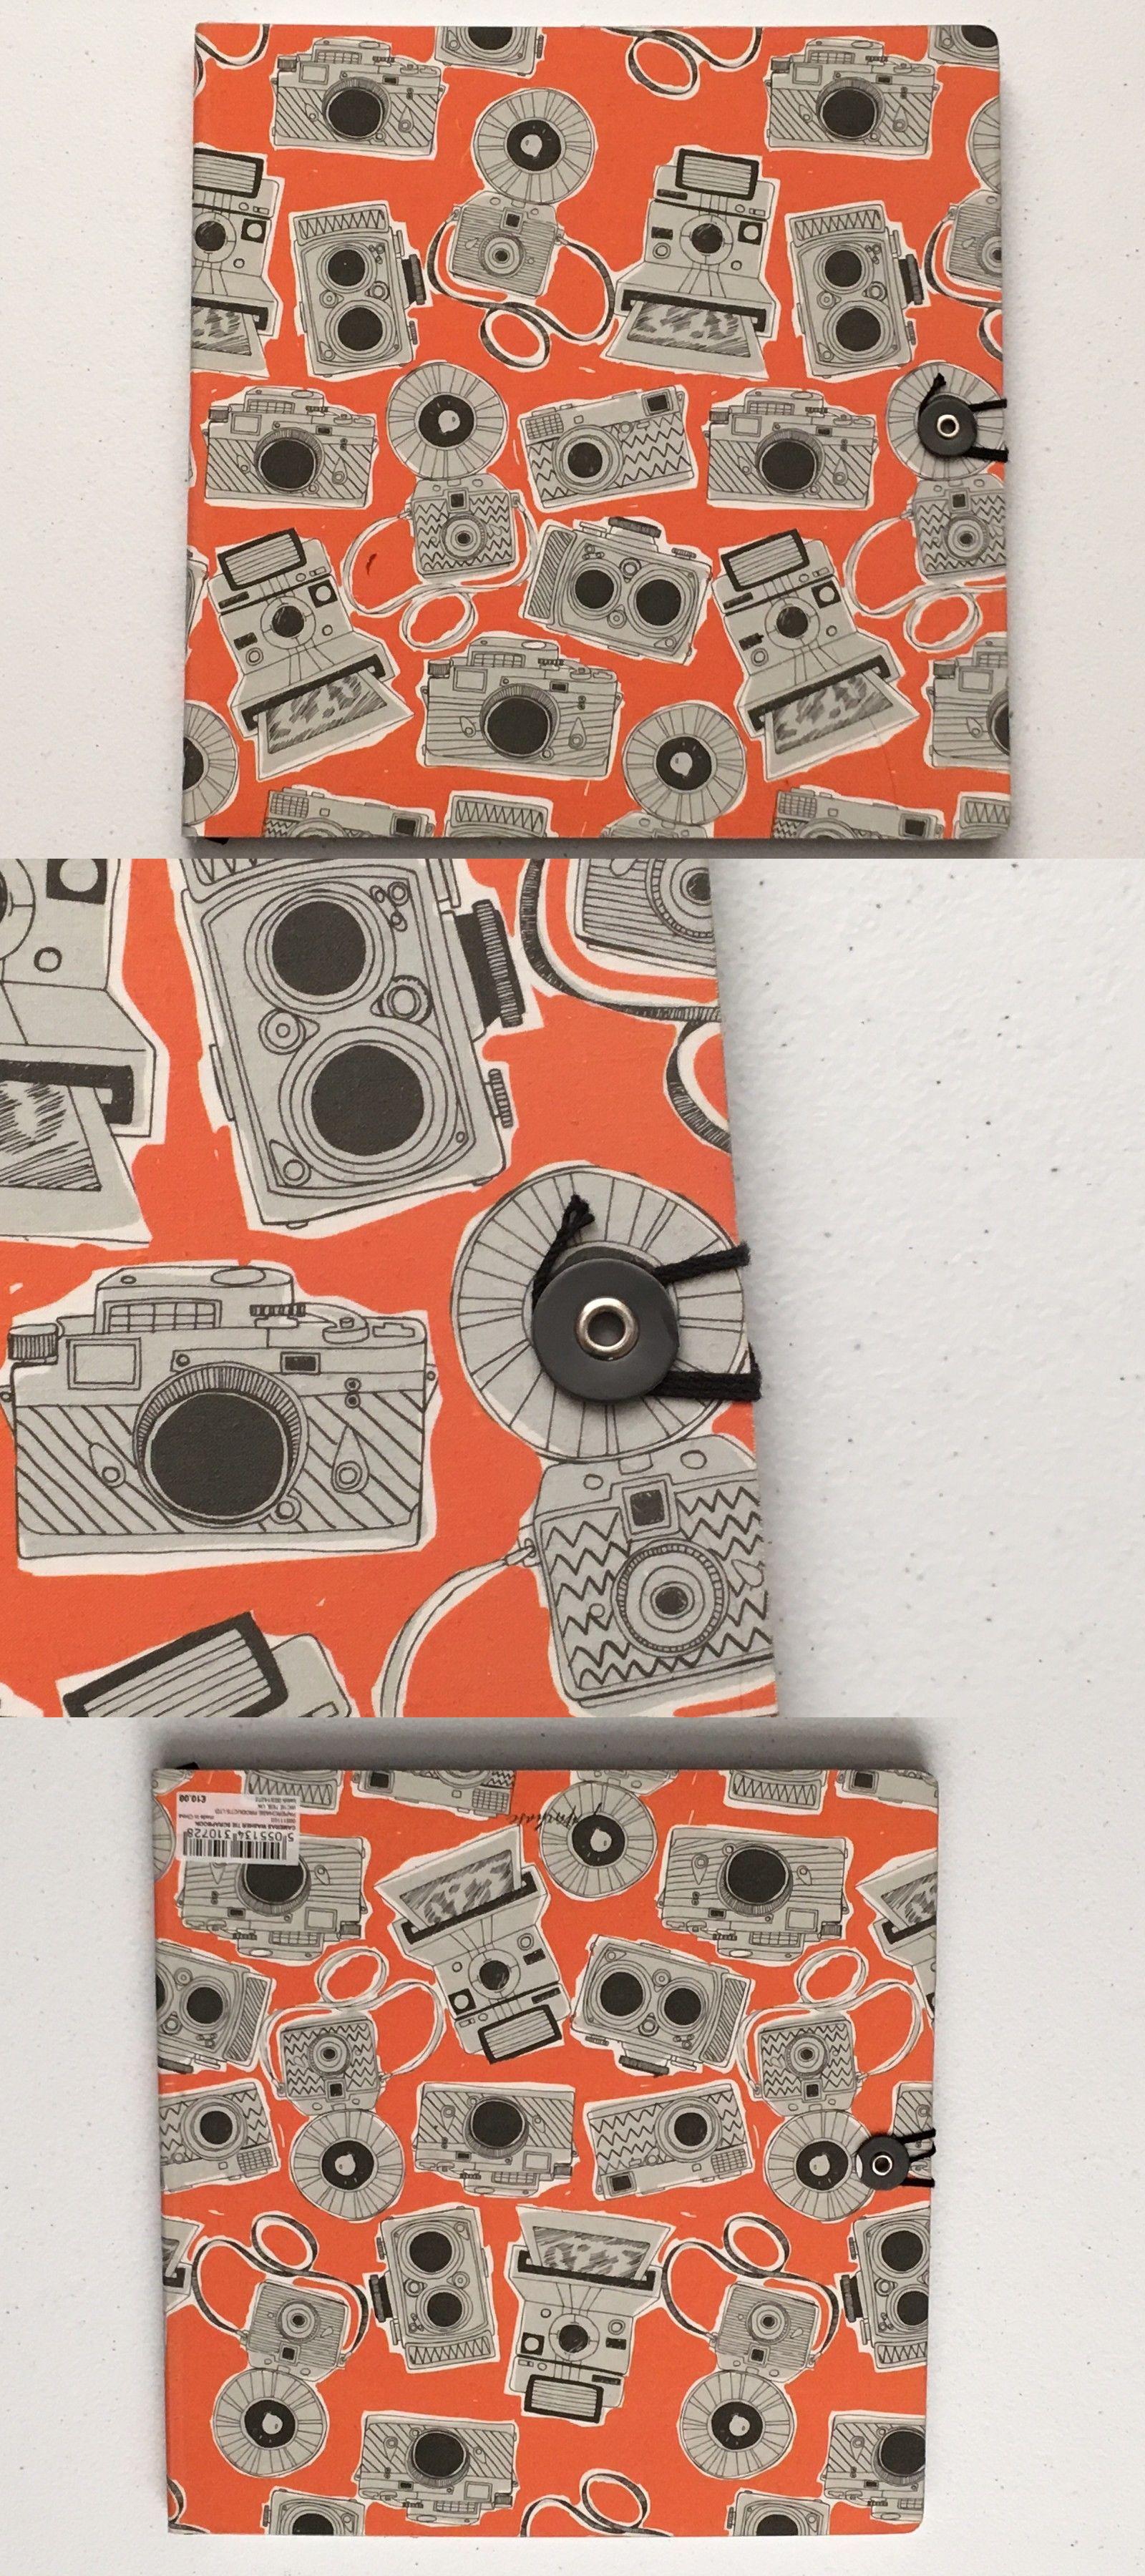 Scrapbooking Albums And Refills 183248 Orange Paperchase Scrapbook